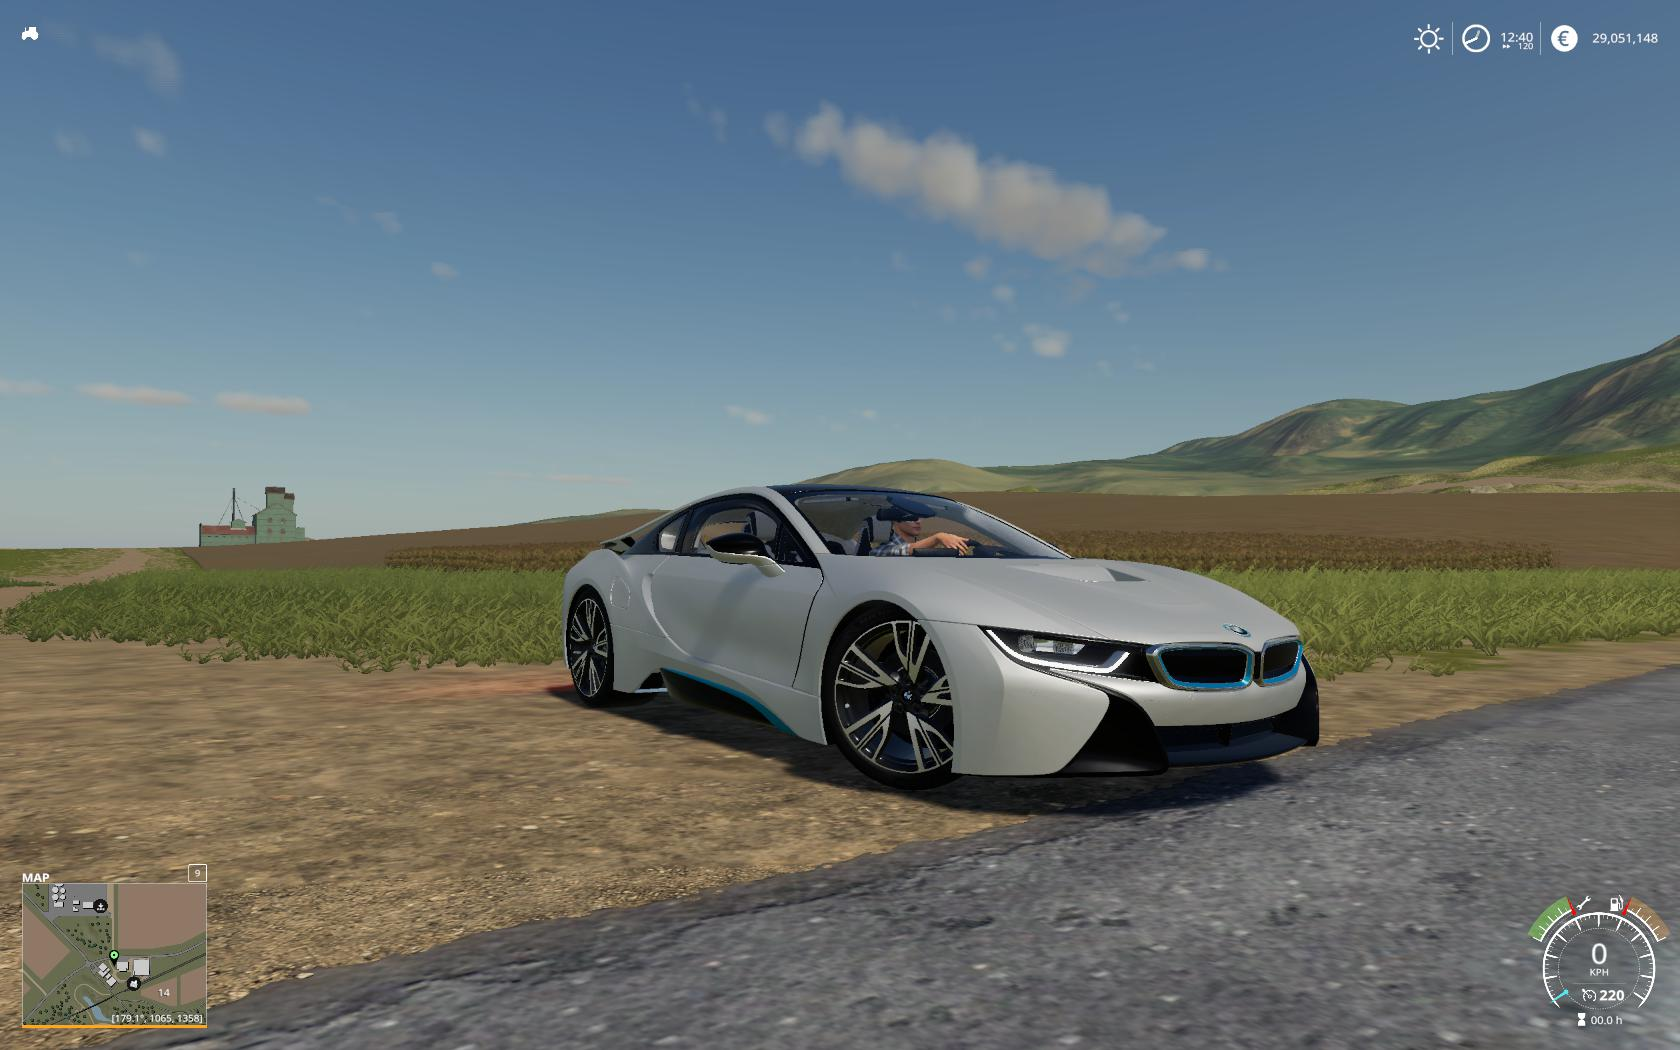 FS19 - BMW I8 Car Mod V1.0